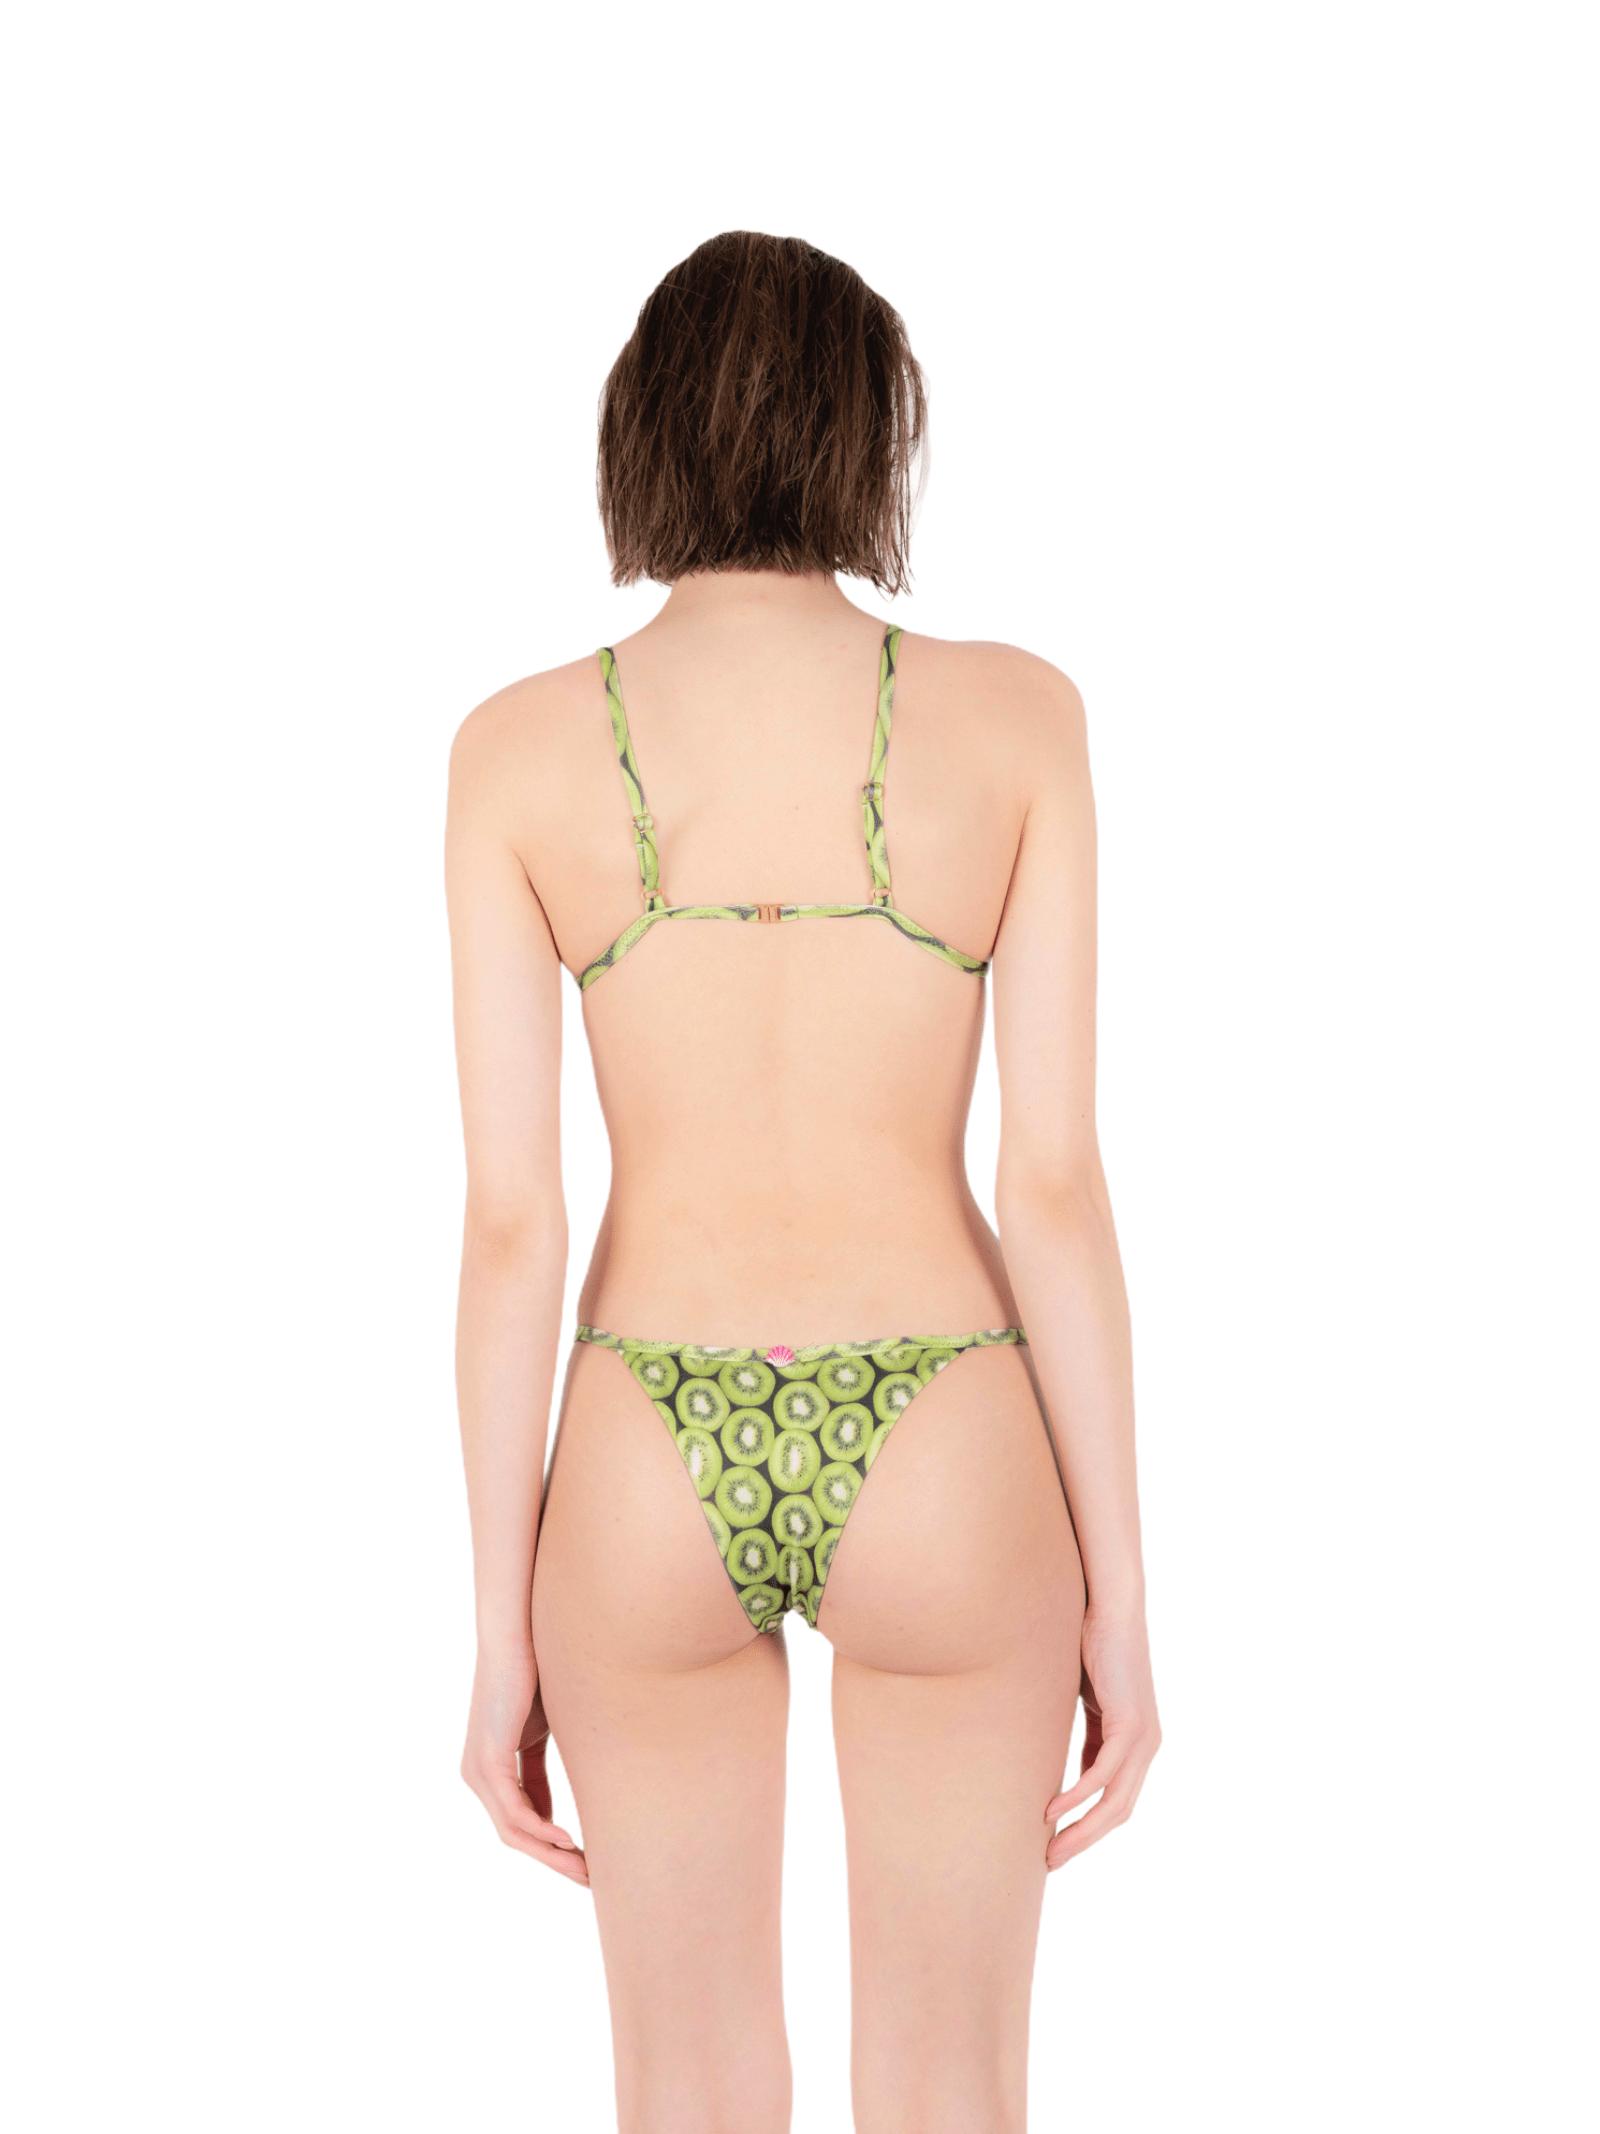 Triangle bikini with thong slip ANNAMARE | 23 | BK-103VERDE